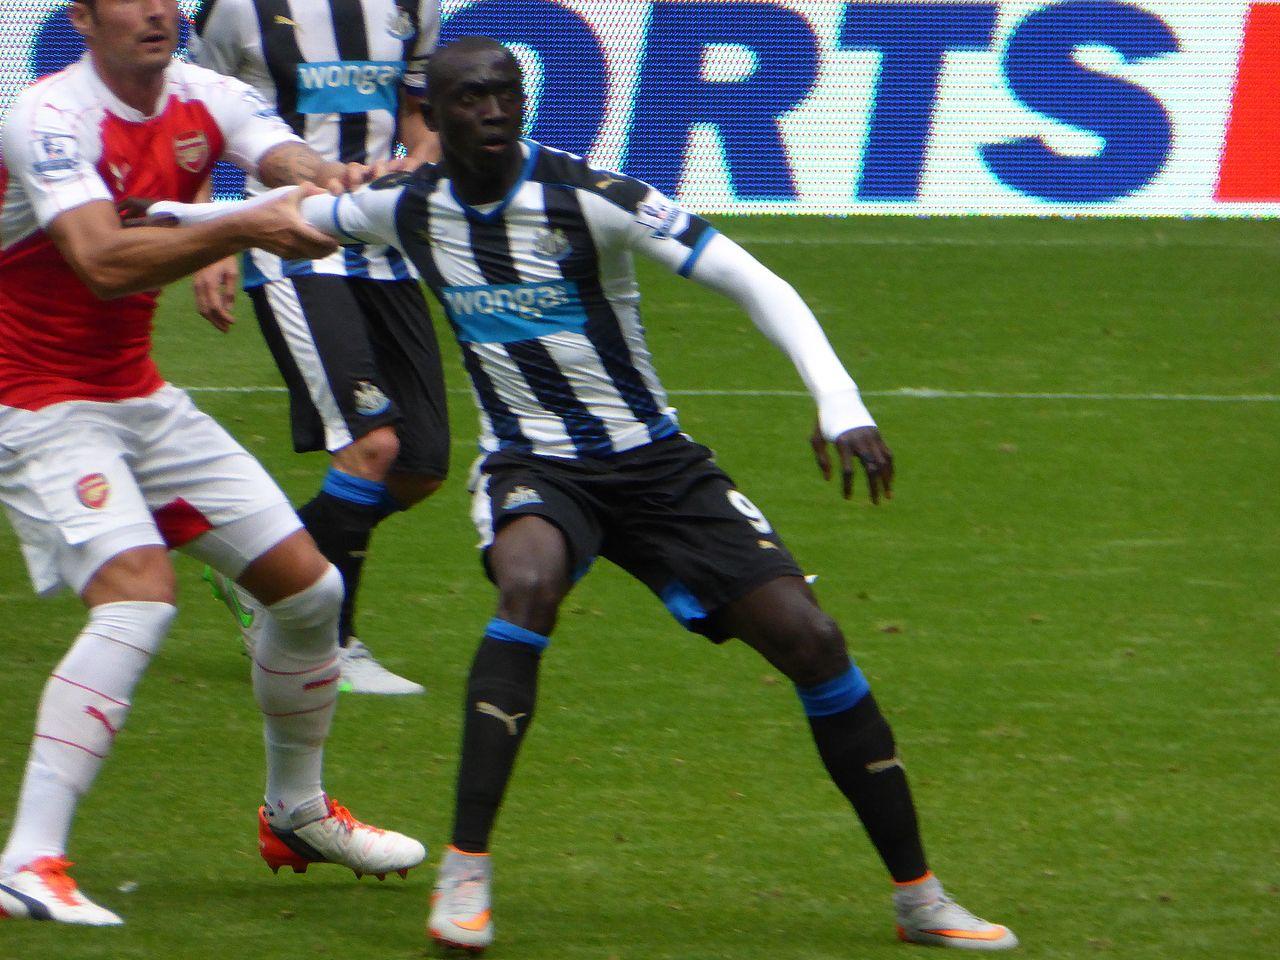 File:Newcastle United vs Arsenal, 29 August 2015 (32).JPG ...